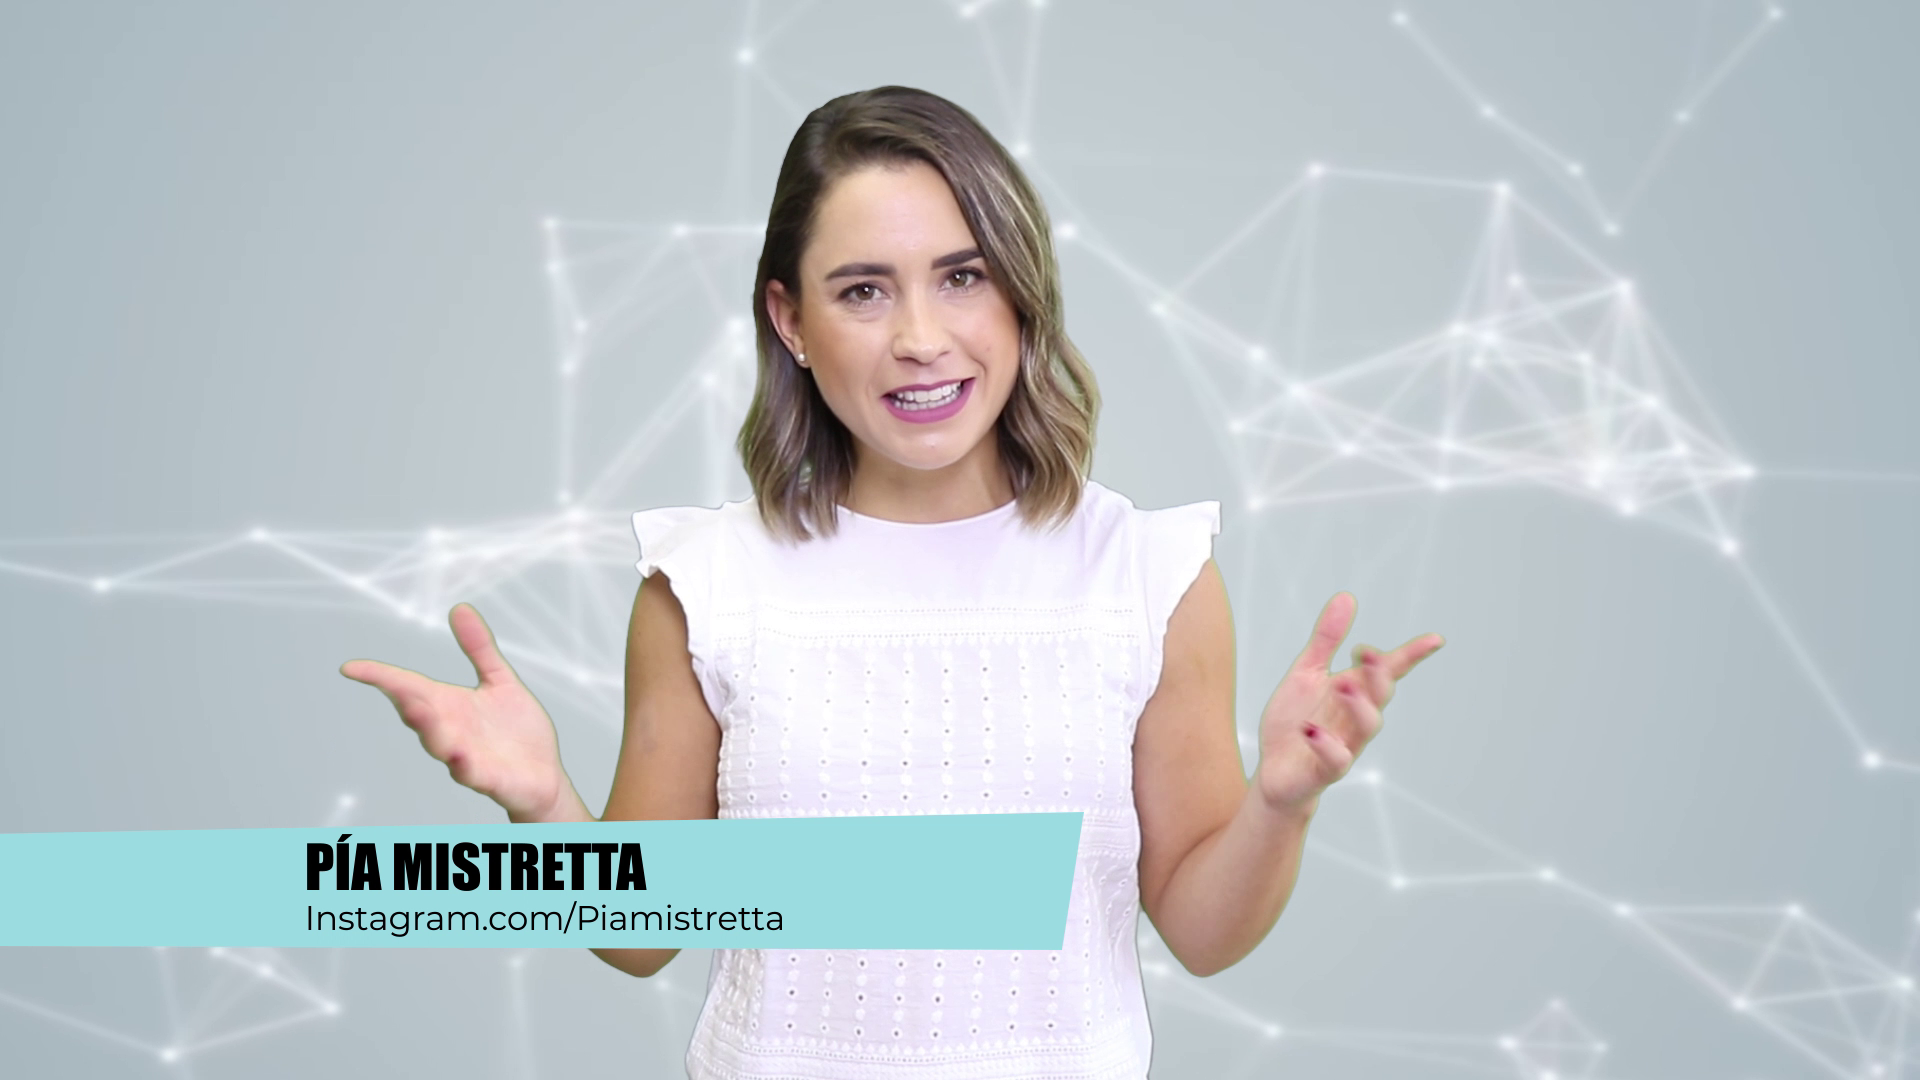 IT Masters News: Habilidades digitales